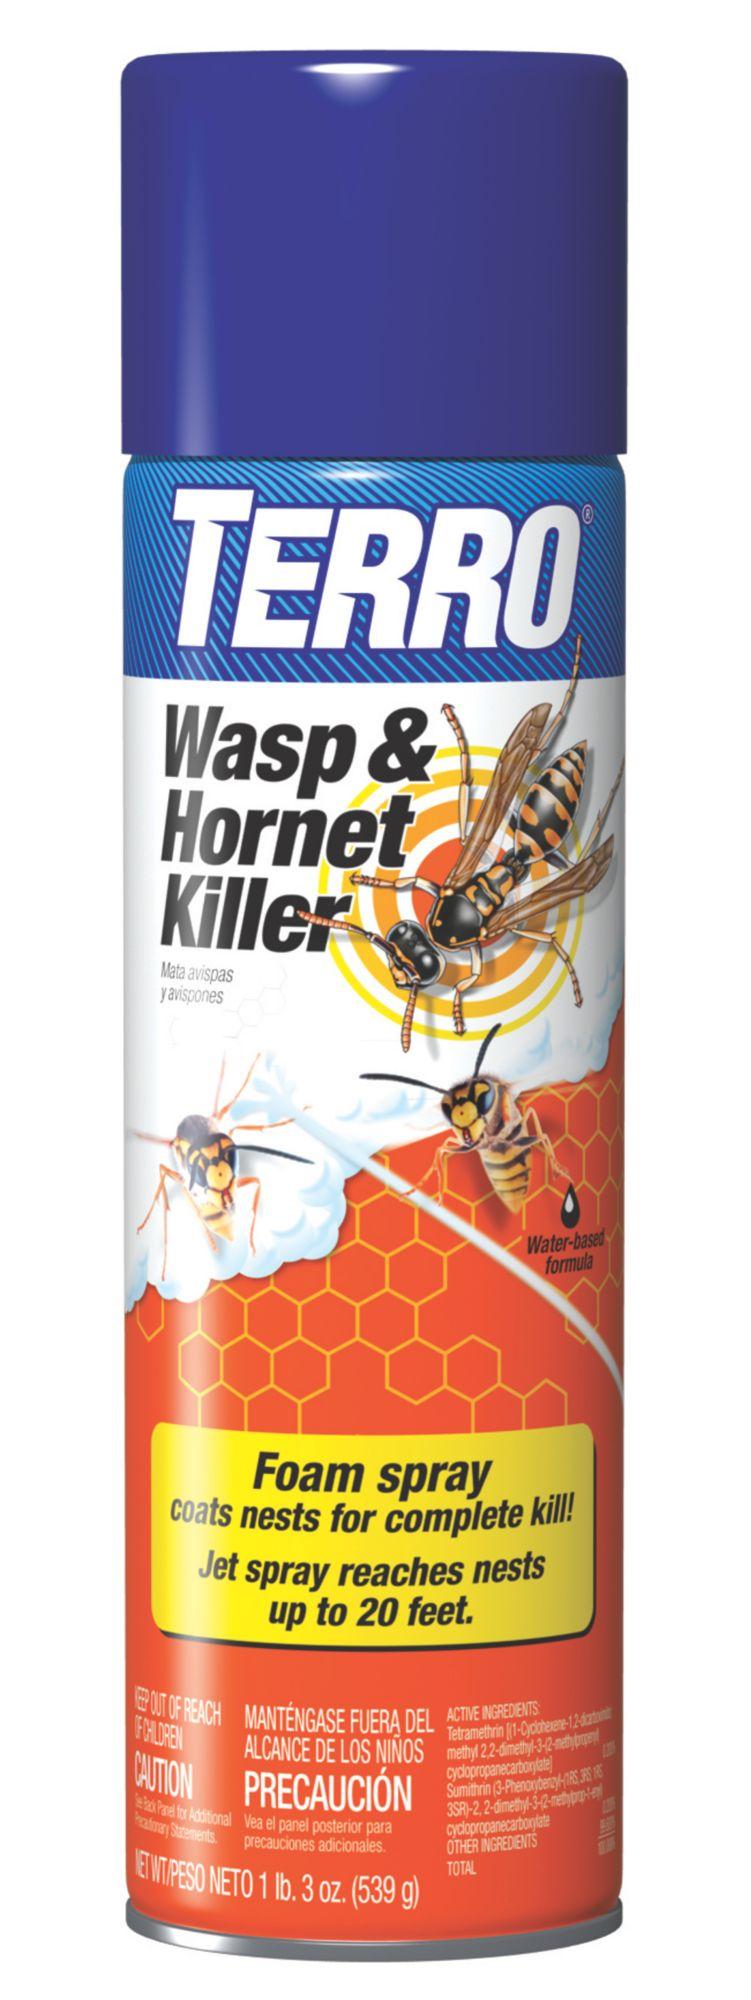 how to use antout spray to kill ant